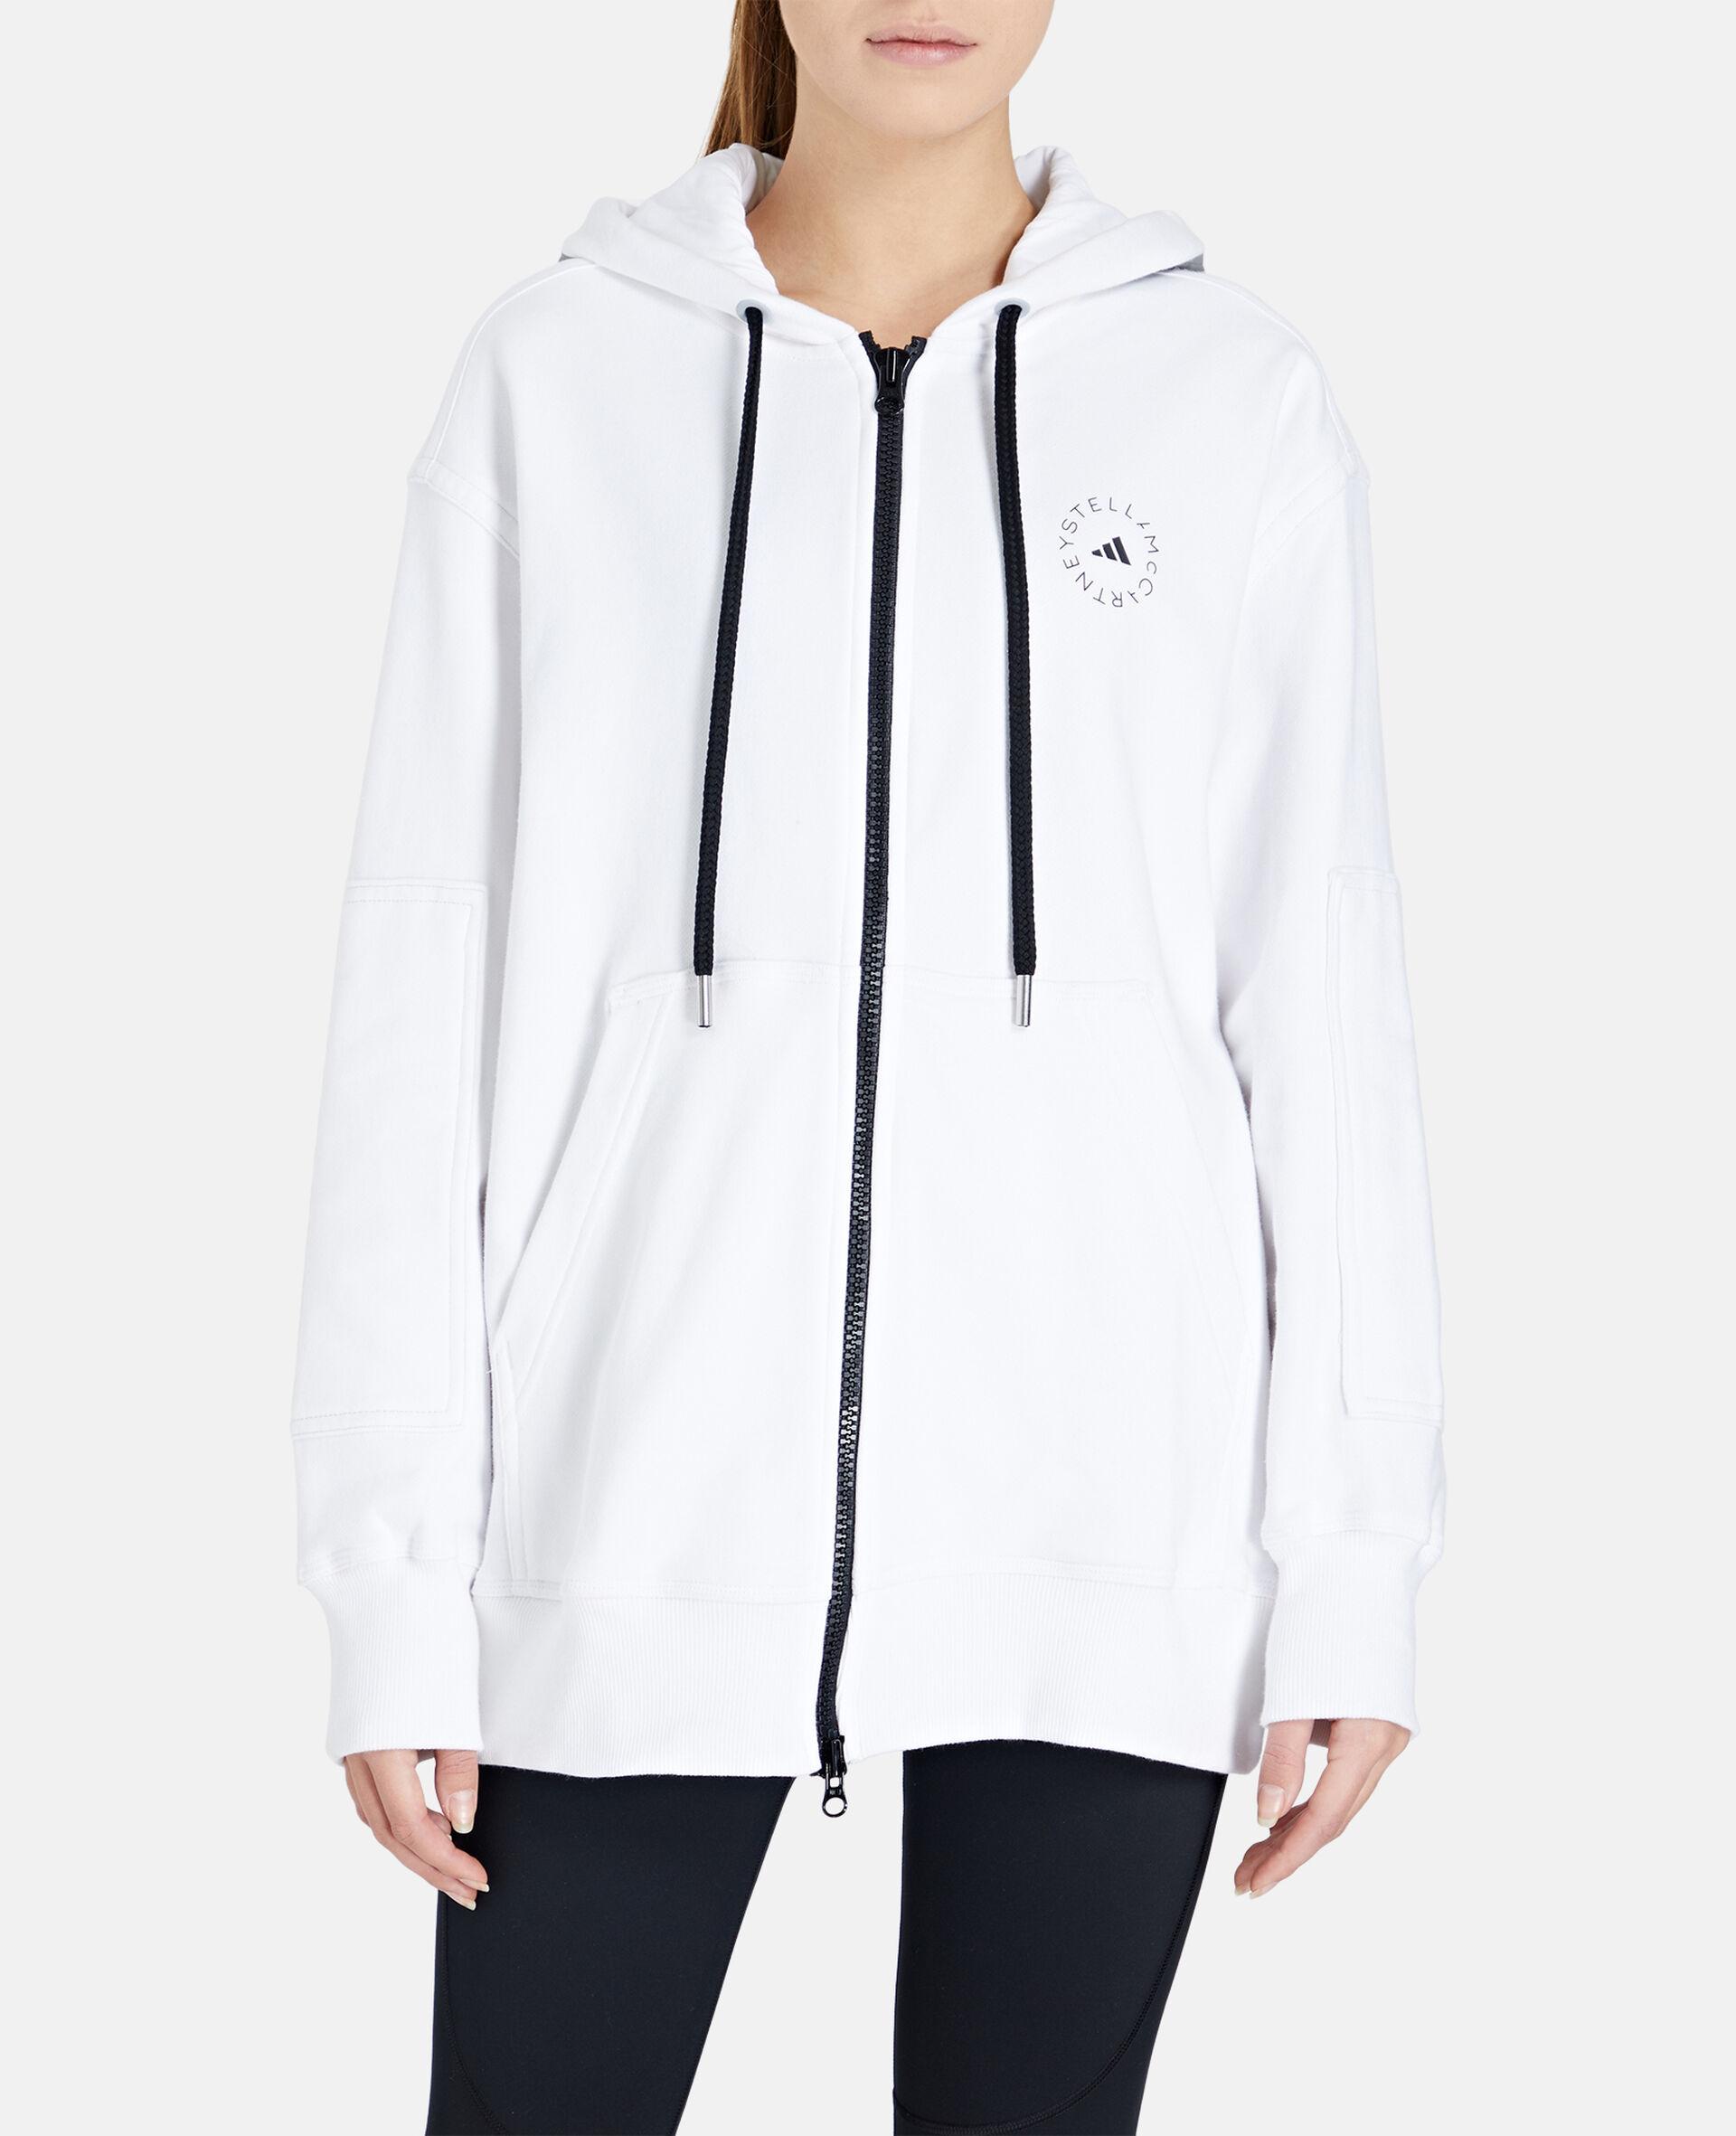 White Full-zip Hoodie-White-large image number 4